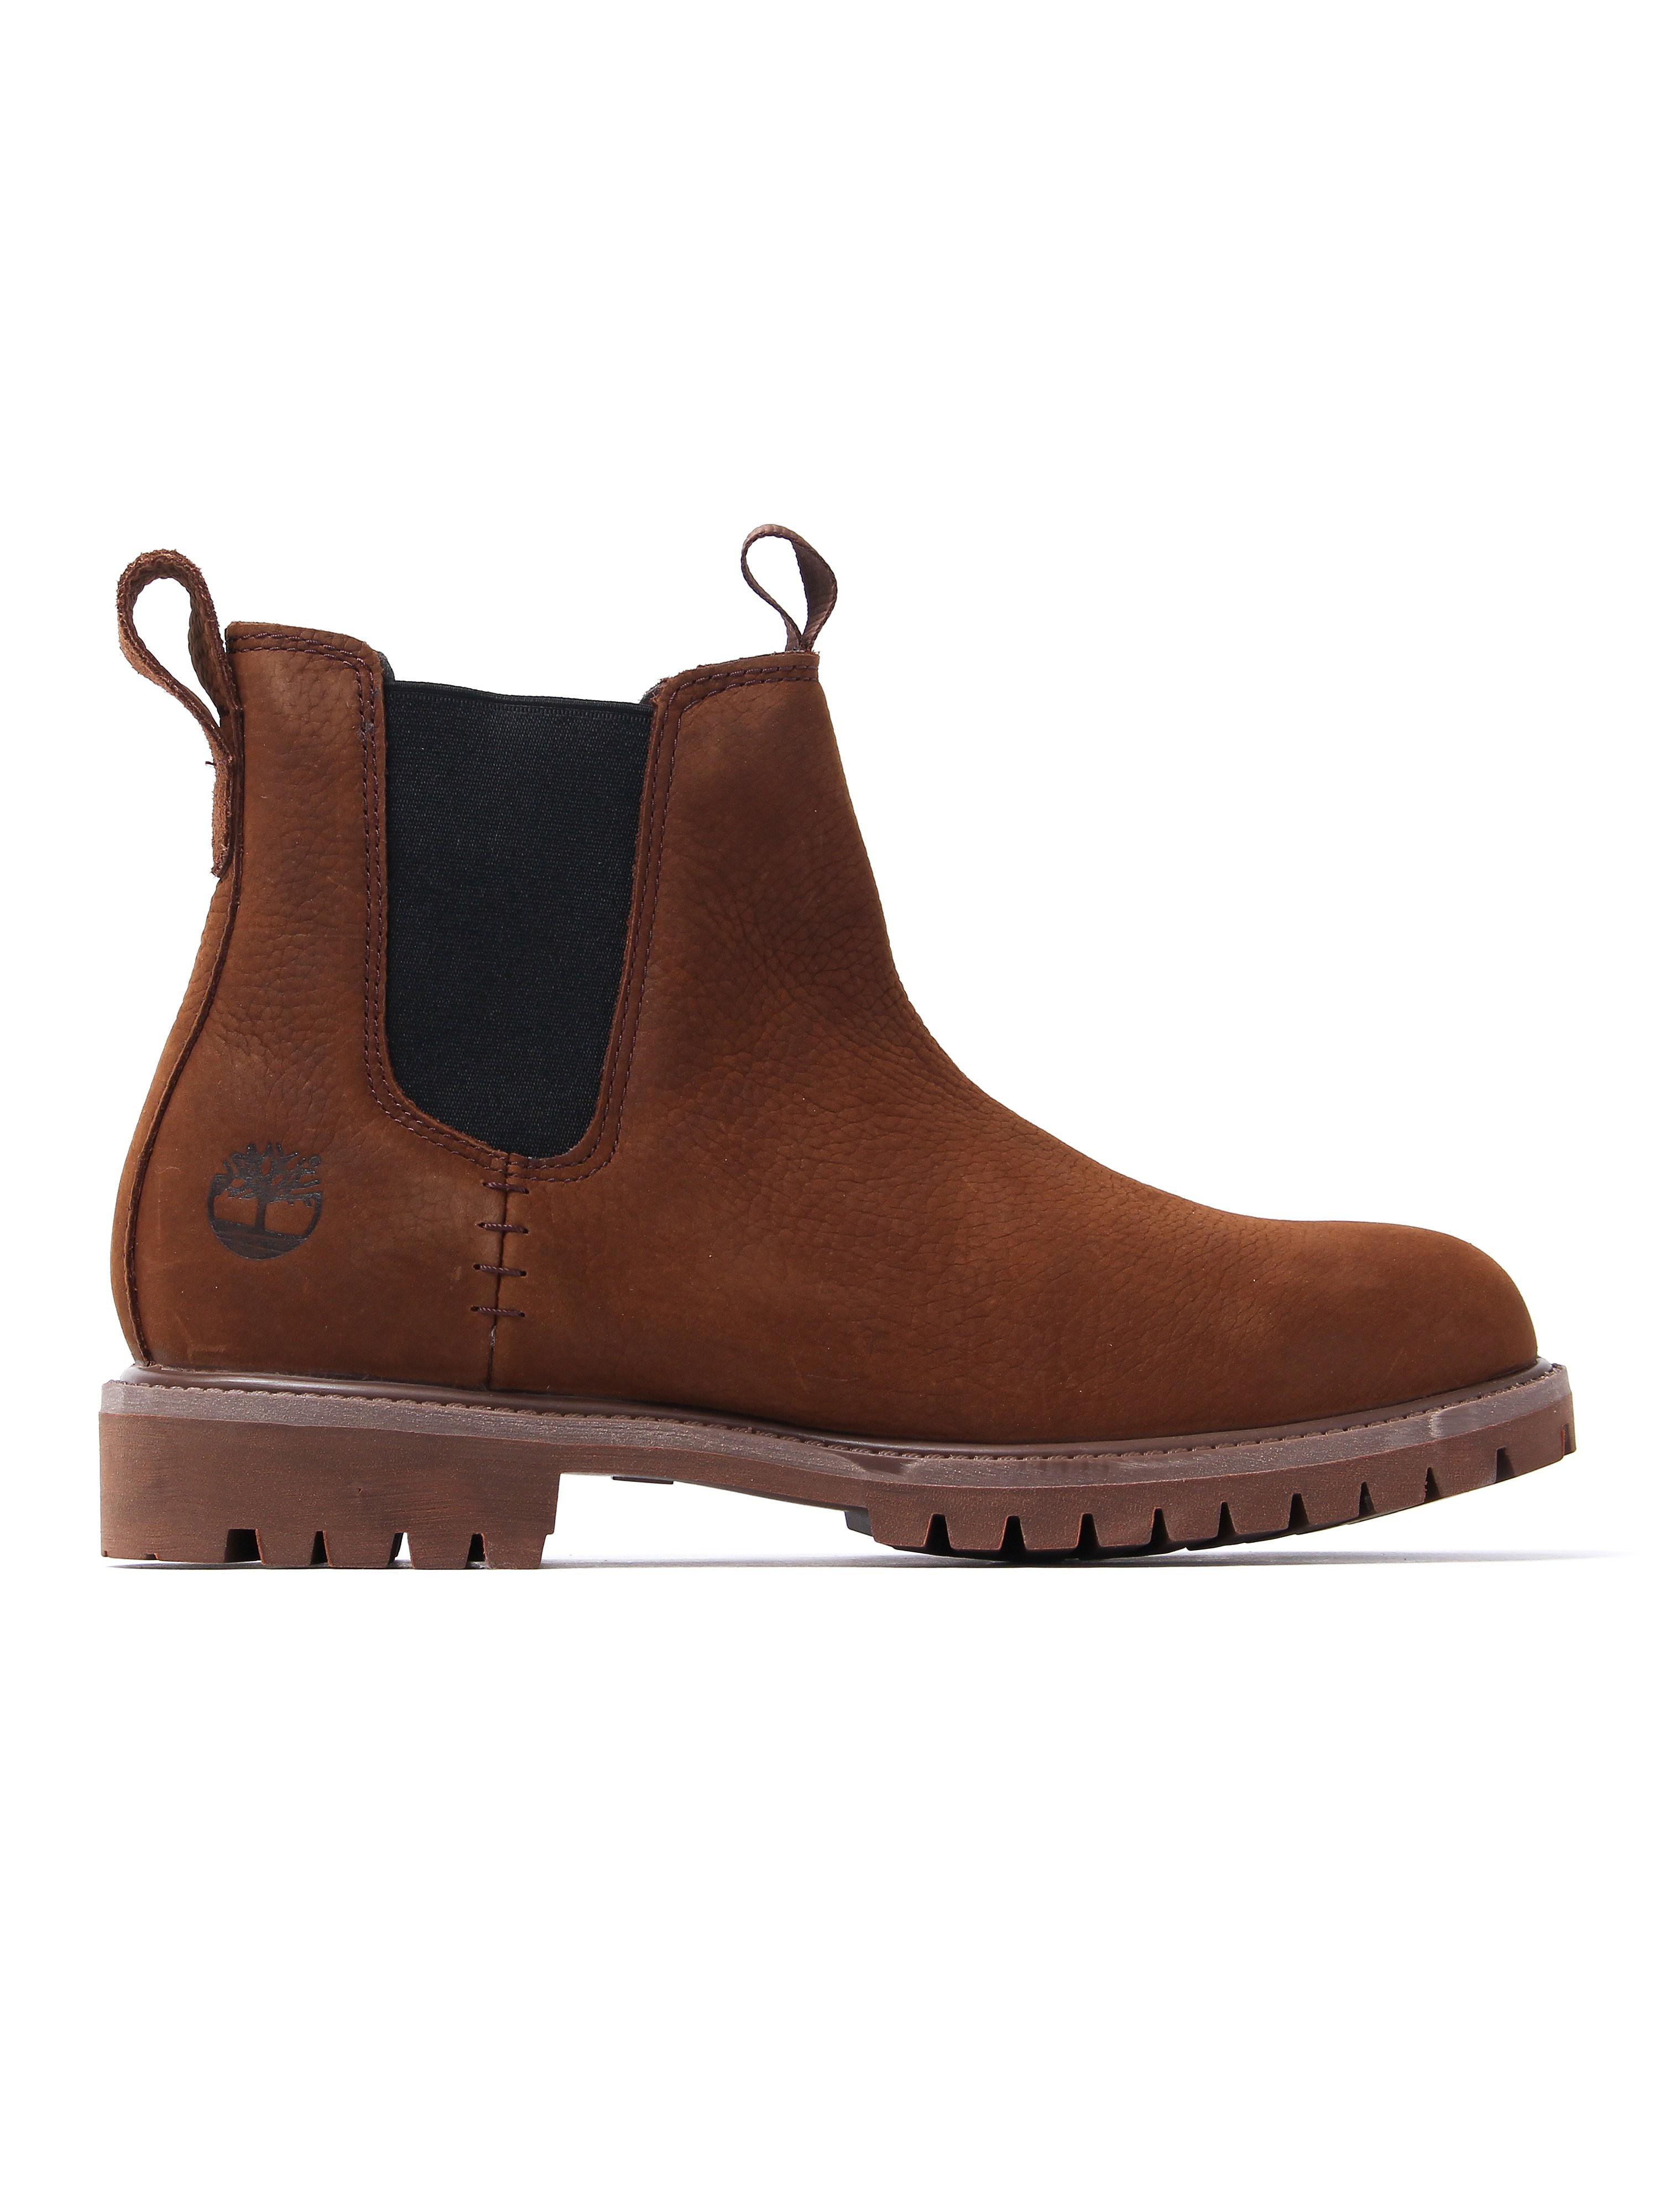 Timberland Men's 6 Inch Premium Chelsea Boots - Potting Soil Nubuck